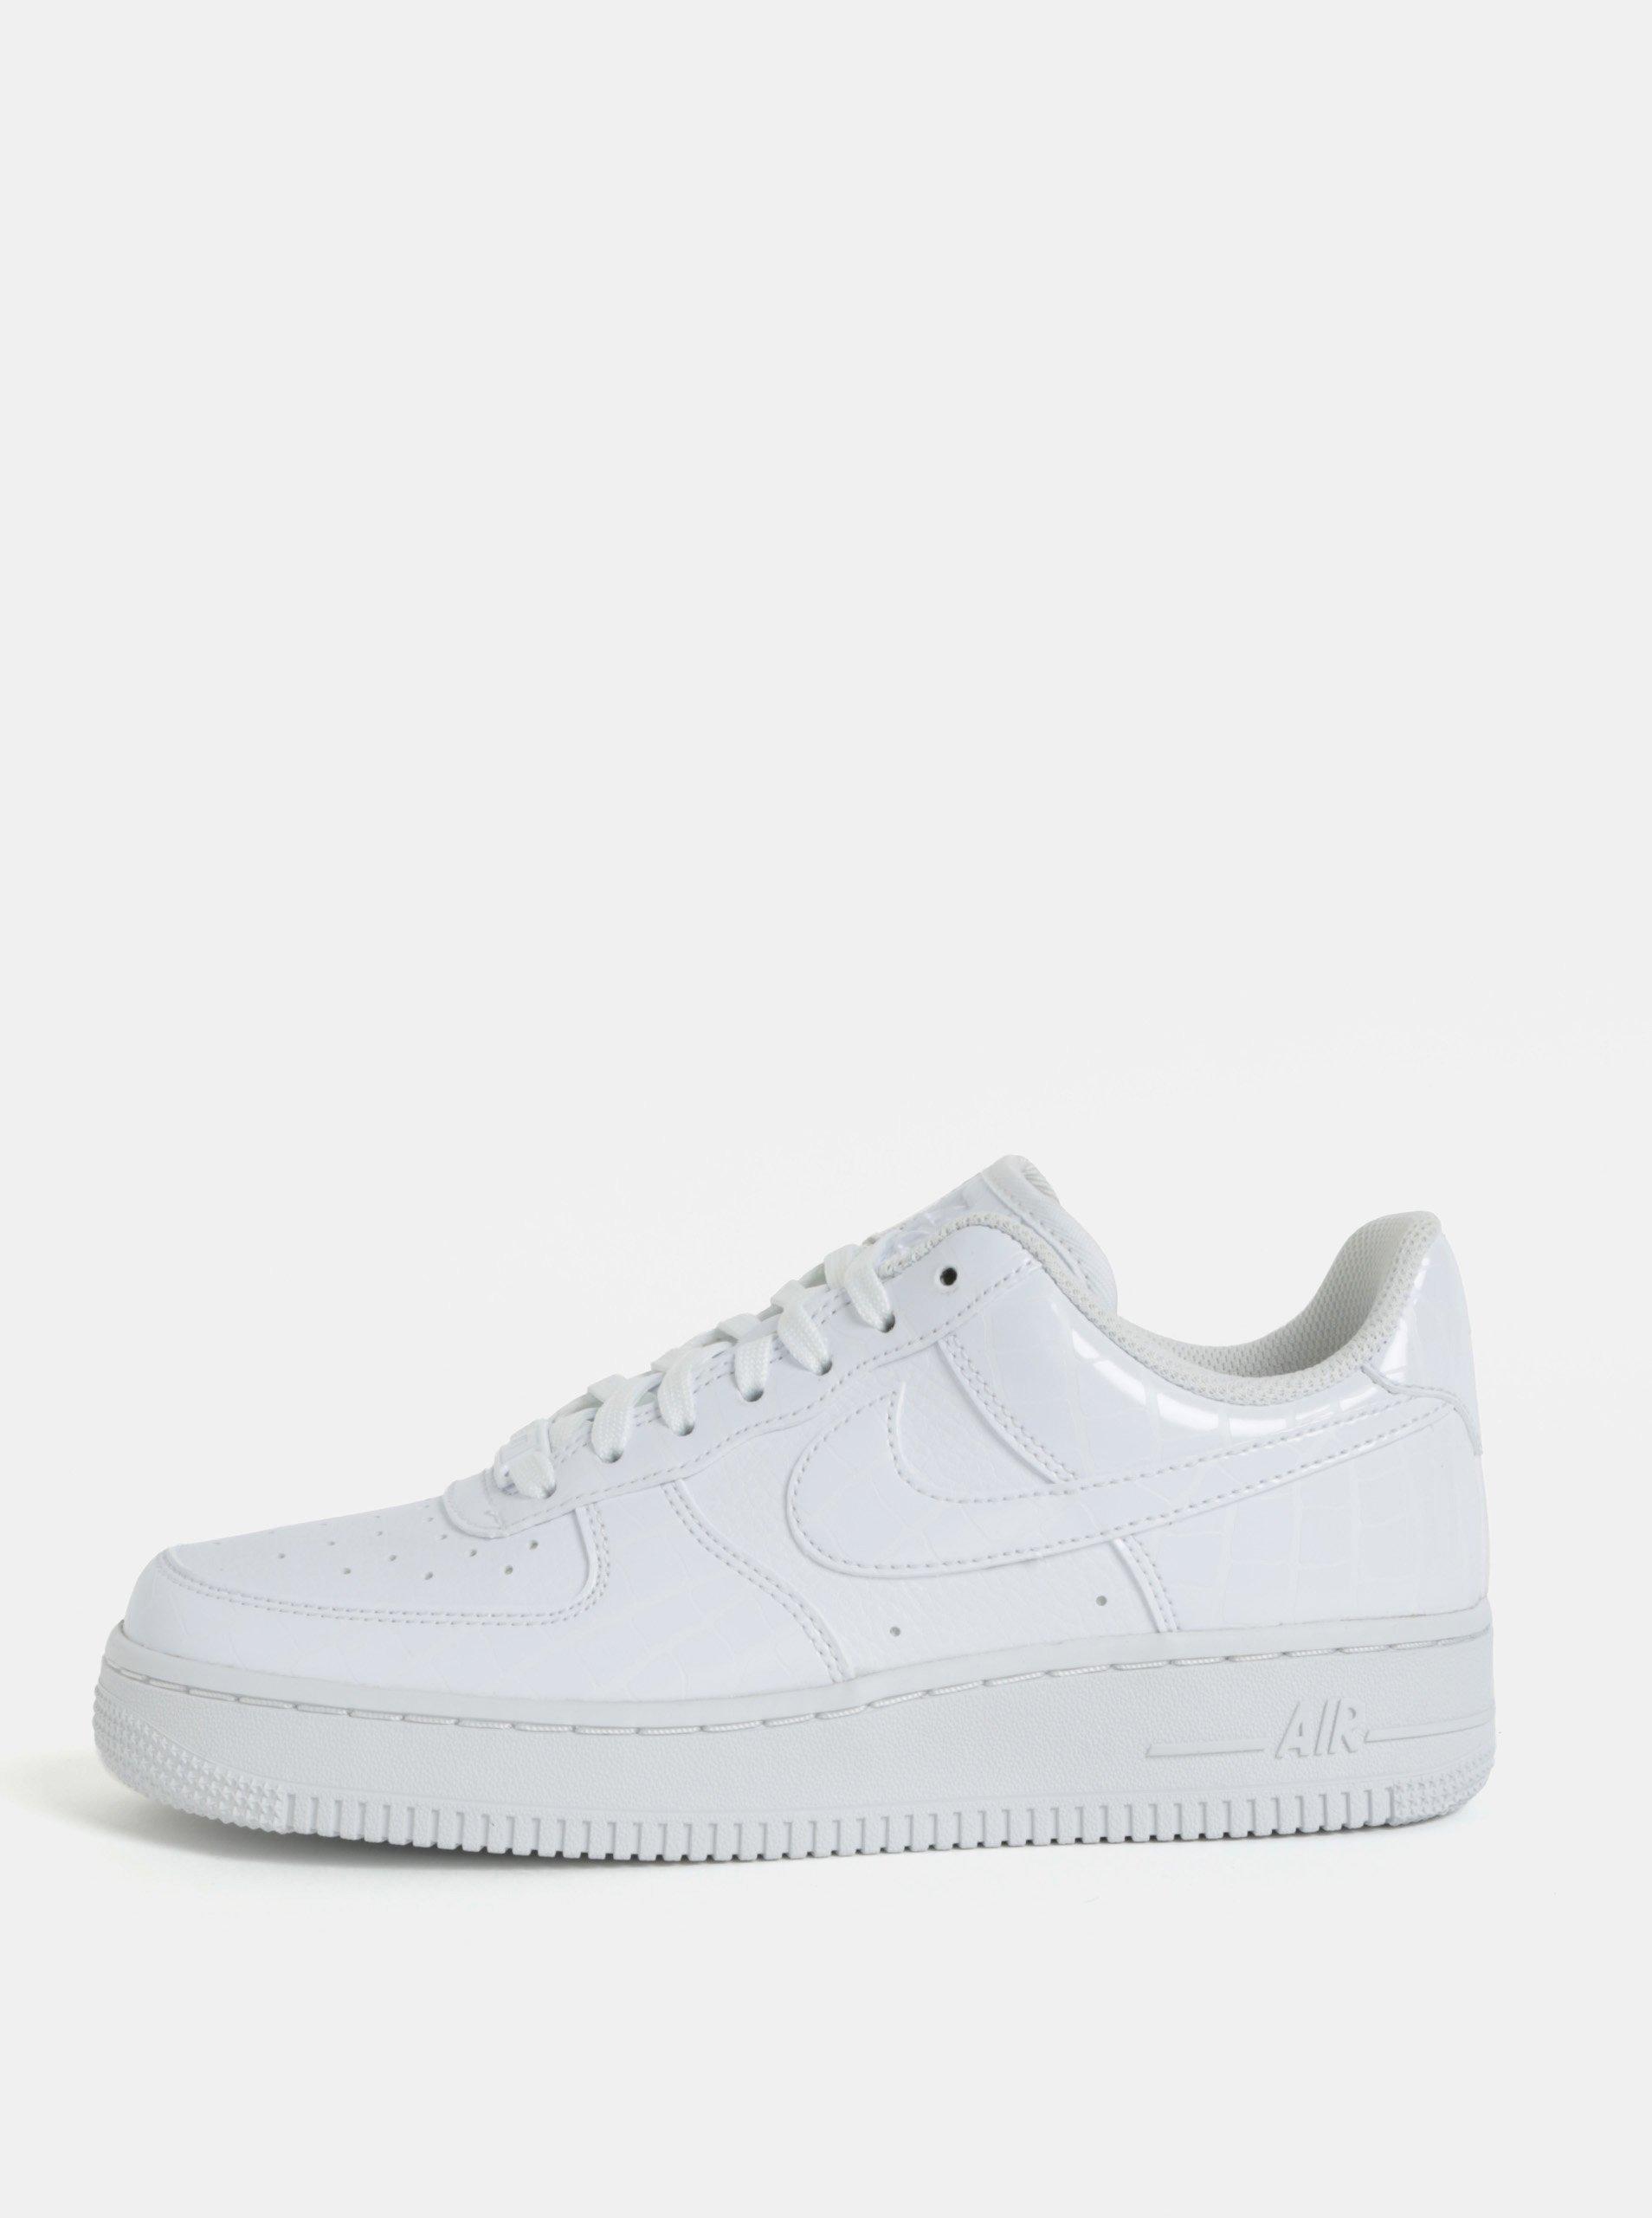 4a91e296ebb3 Biele dámske tenisky na platforme Nike Air Force1